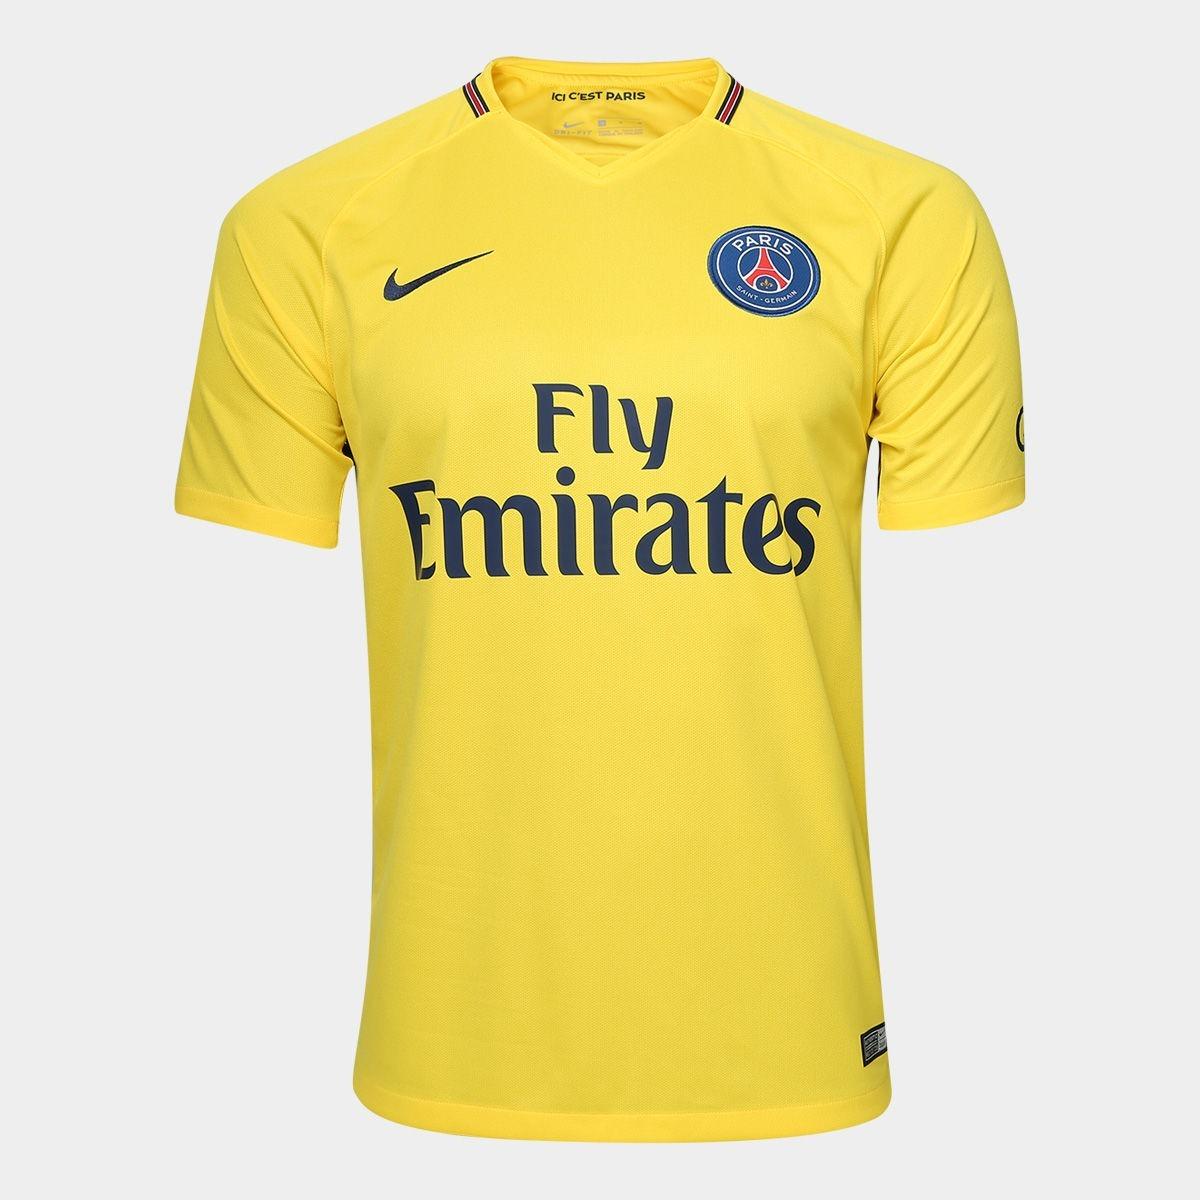 f7cad0d4917bb camisa paris saint germain away 2018 nº 10 neymar jr-amarela. Carregando  zoom.